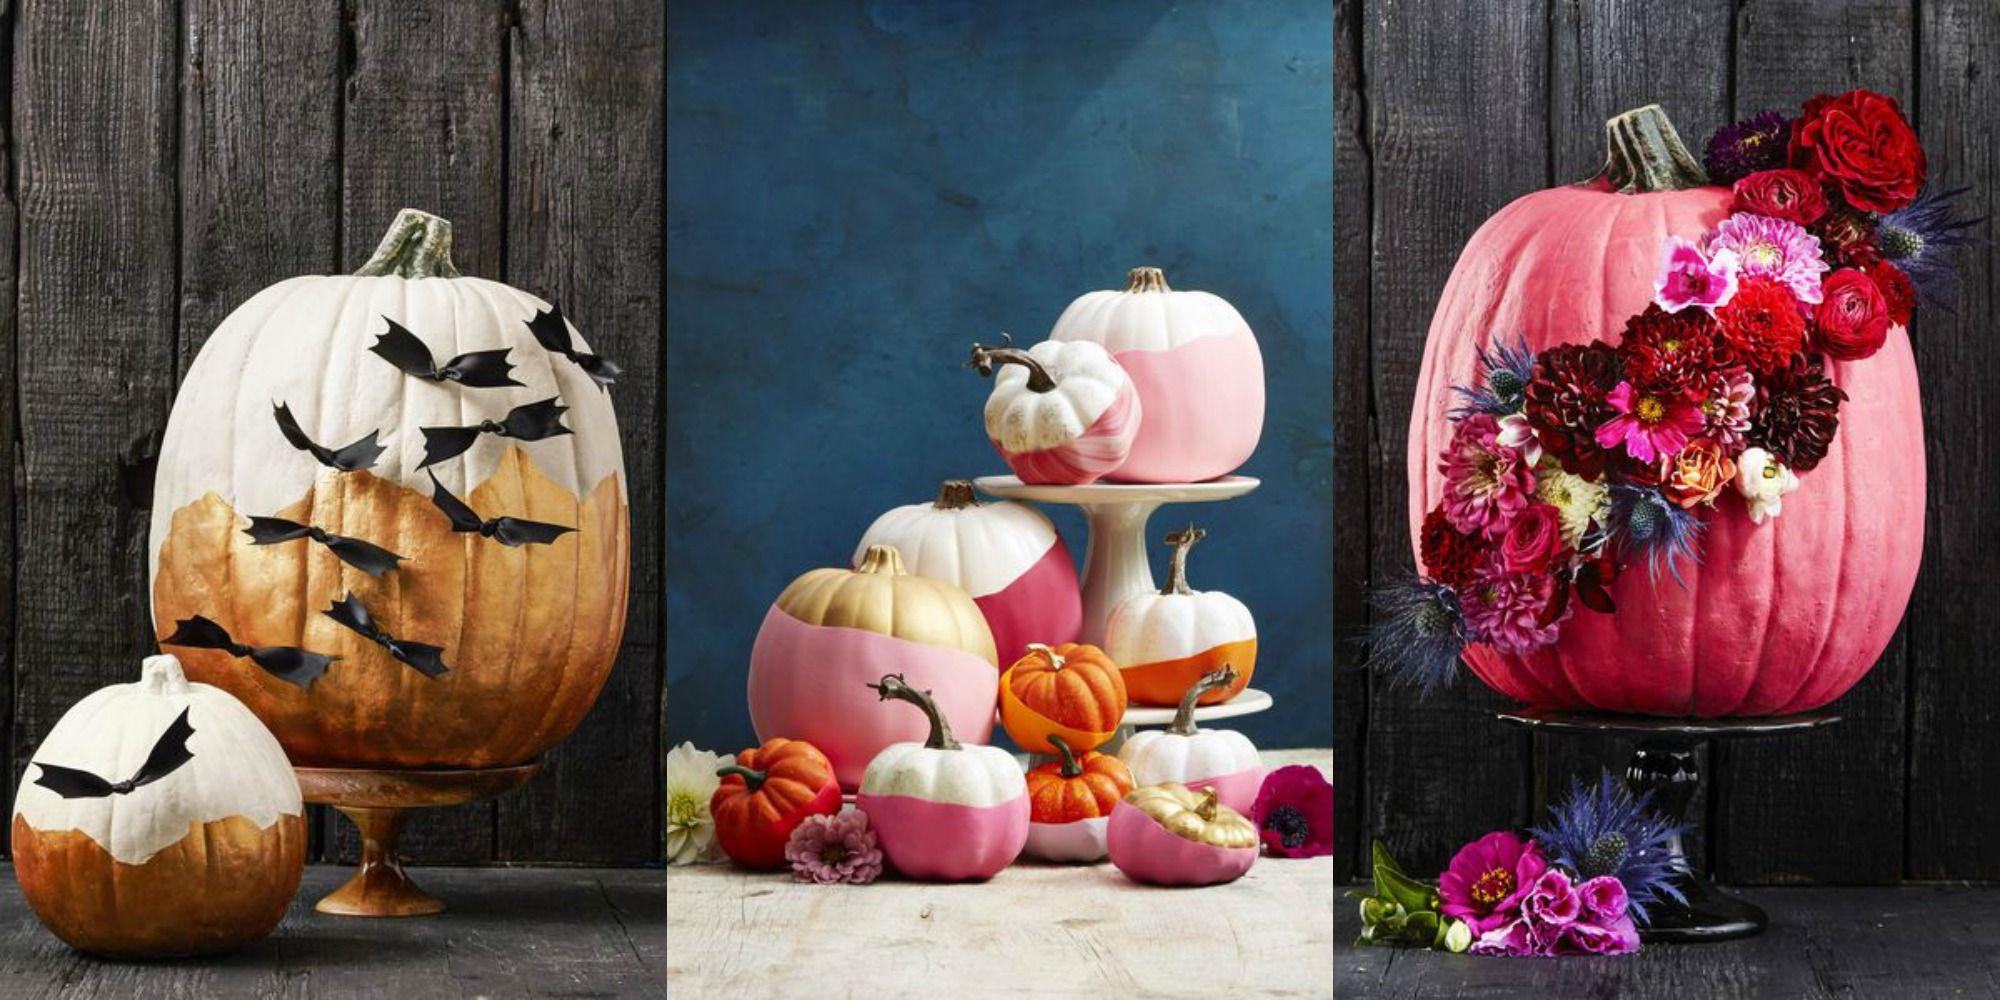 Creative no carve pumpkin decorating ideas for halloween